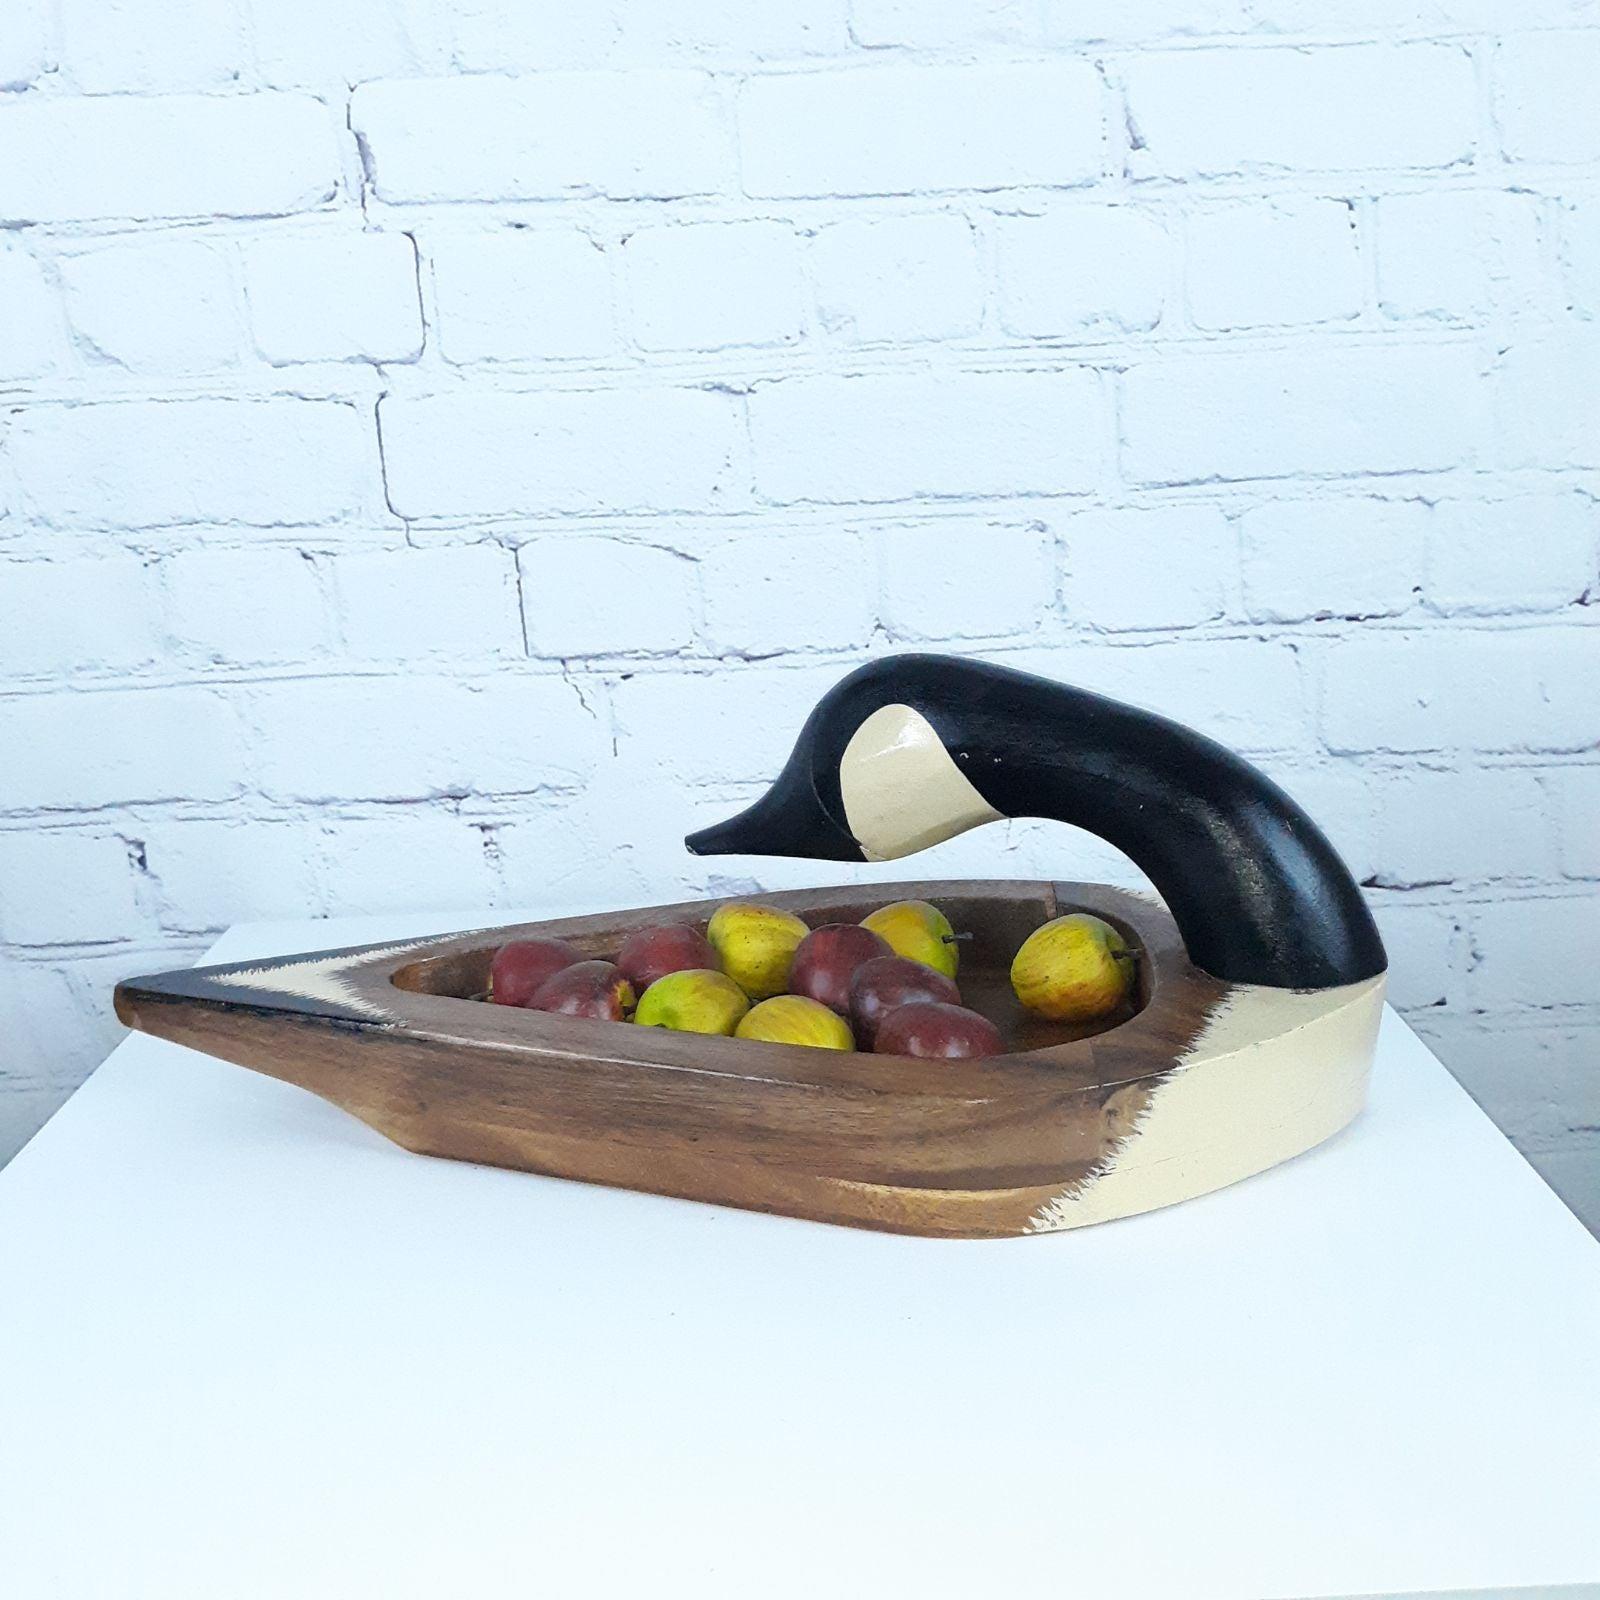 VTG Wooden Canada Goose Nut Fruit Tray